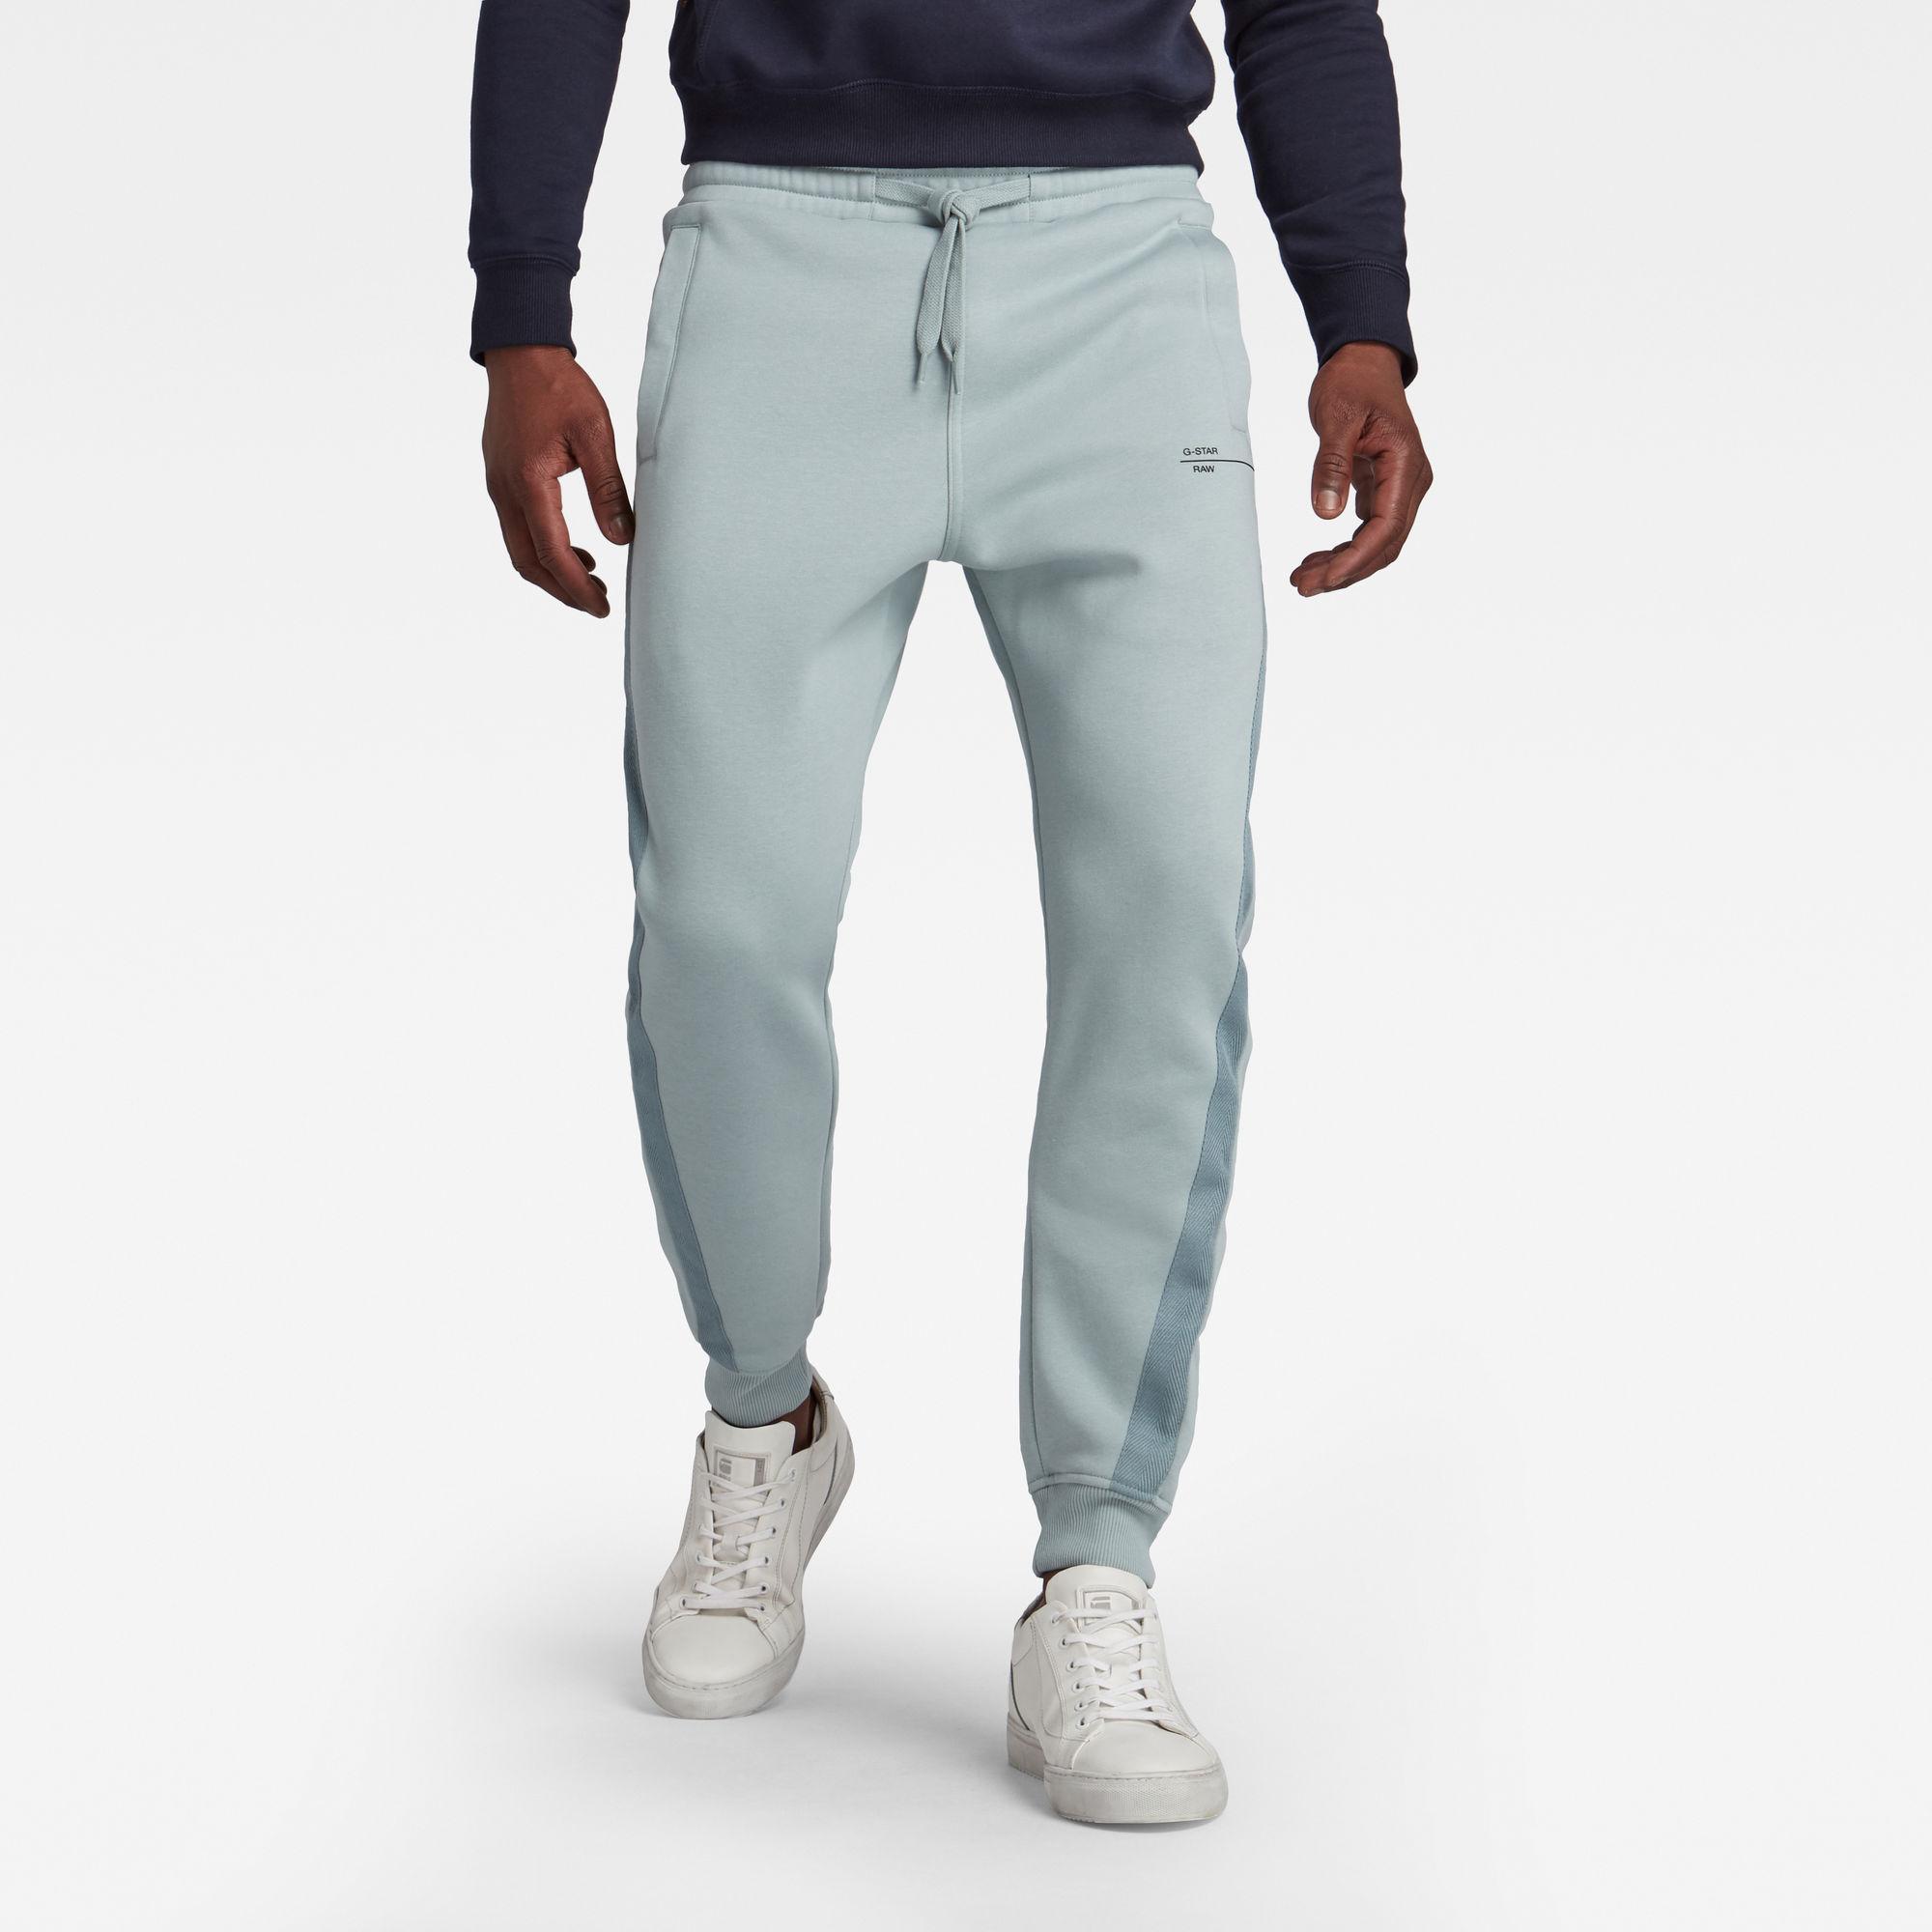 G-Star RAW Hombre Pantalones deportivos Astra Wrap Azul claro